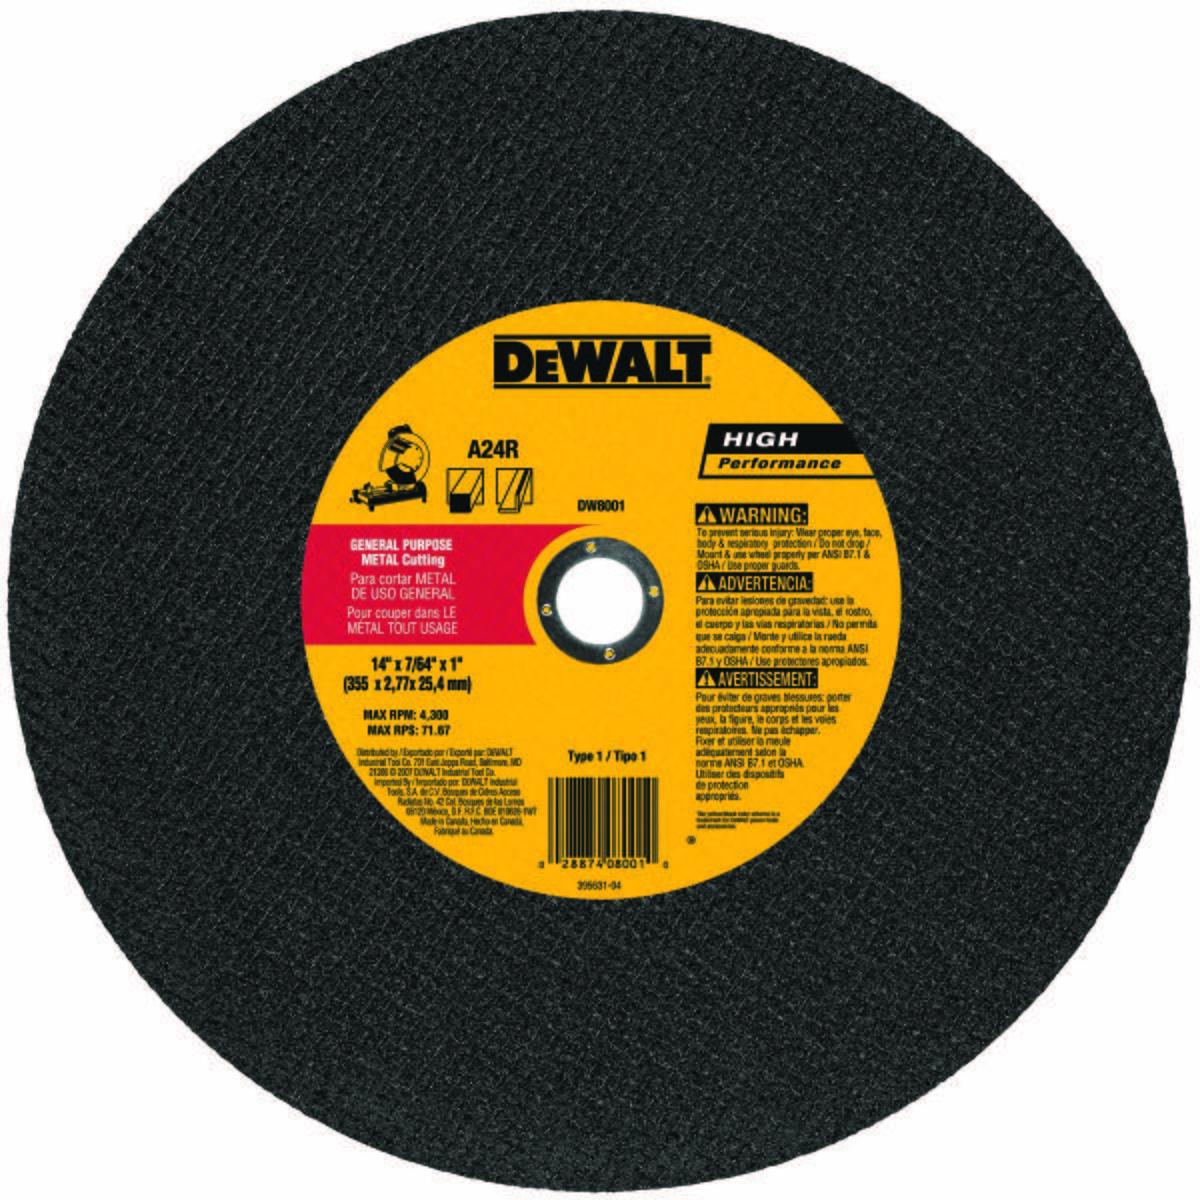 Abrasive Cut-Off Wheel, Abrasive Wheel Type Type 1, Abrasive Wheel Diameter 14 In., Thickness 7/64 In.